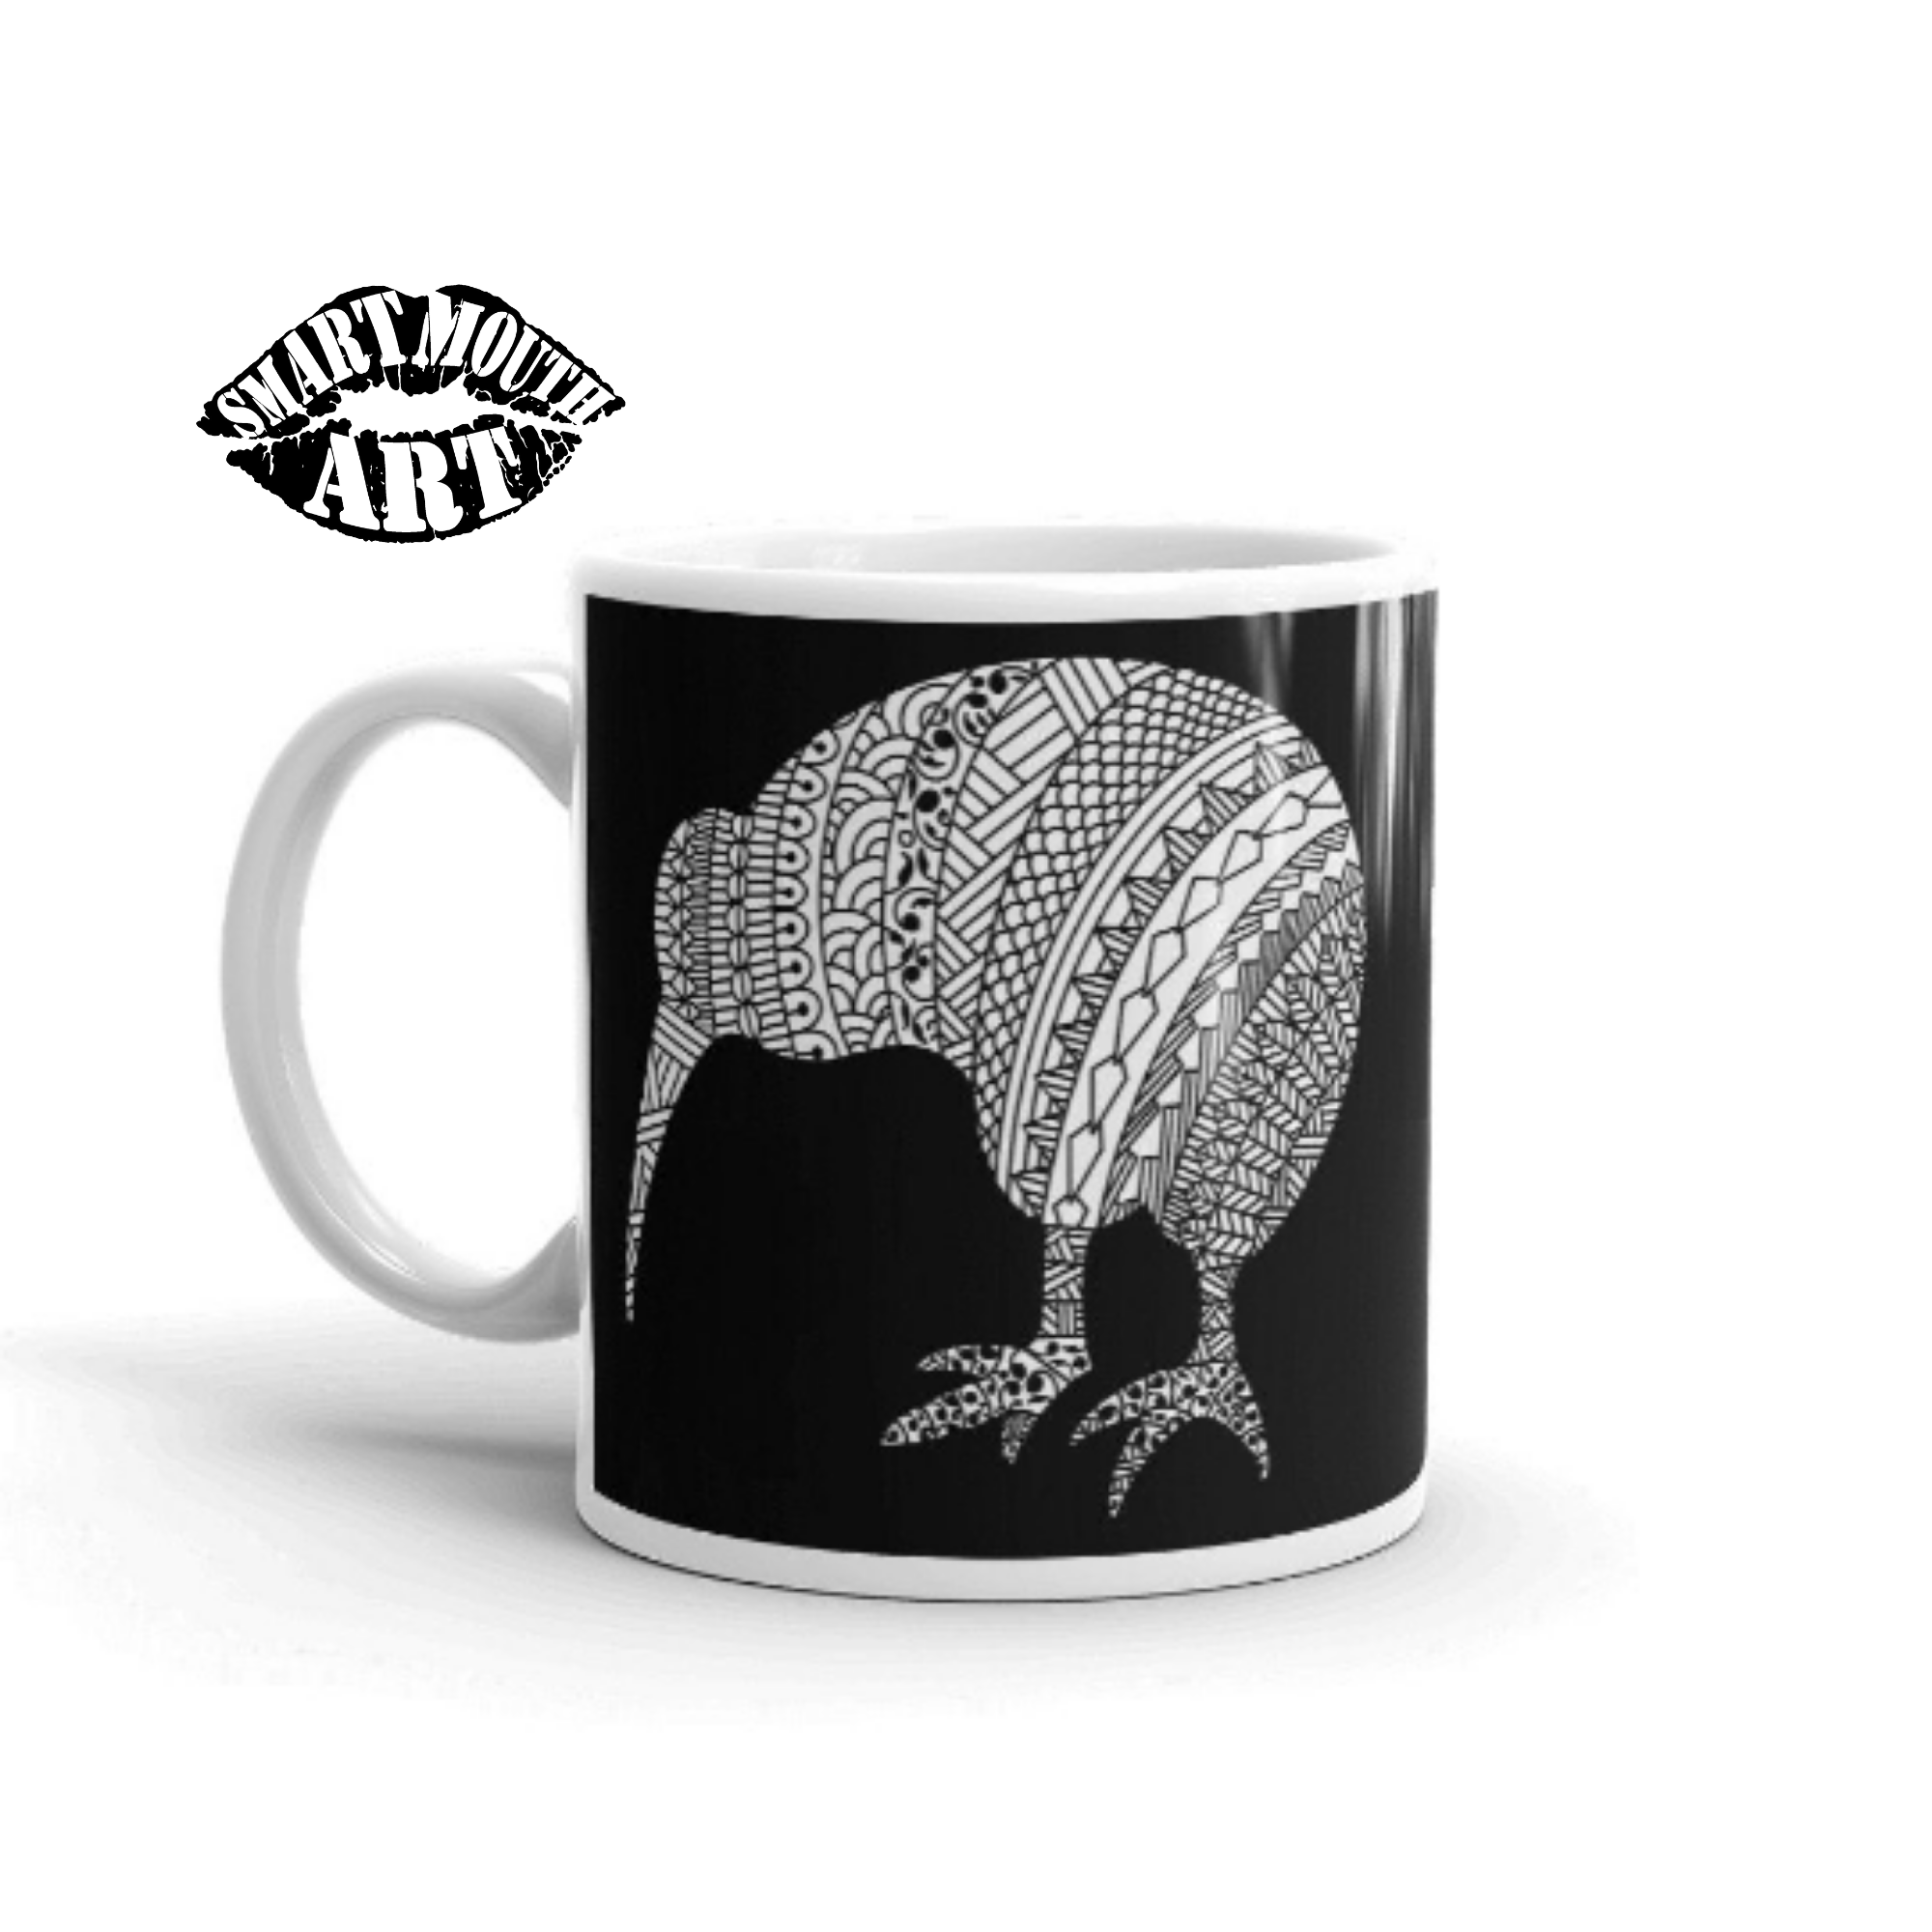 Mandala Design, New Zealand Kiwi Bird Coffee Mug, Drawn by